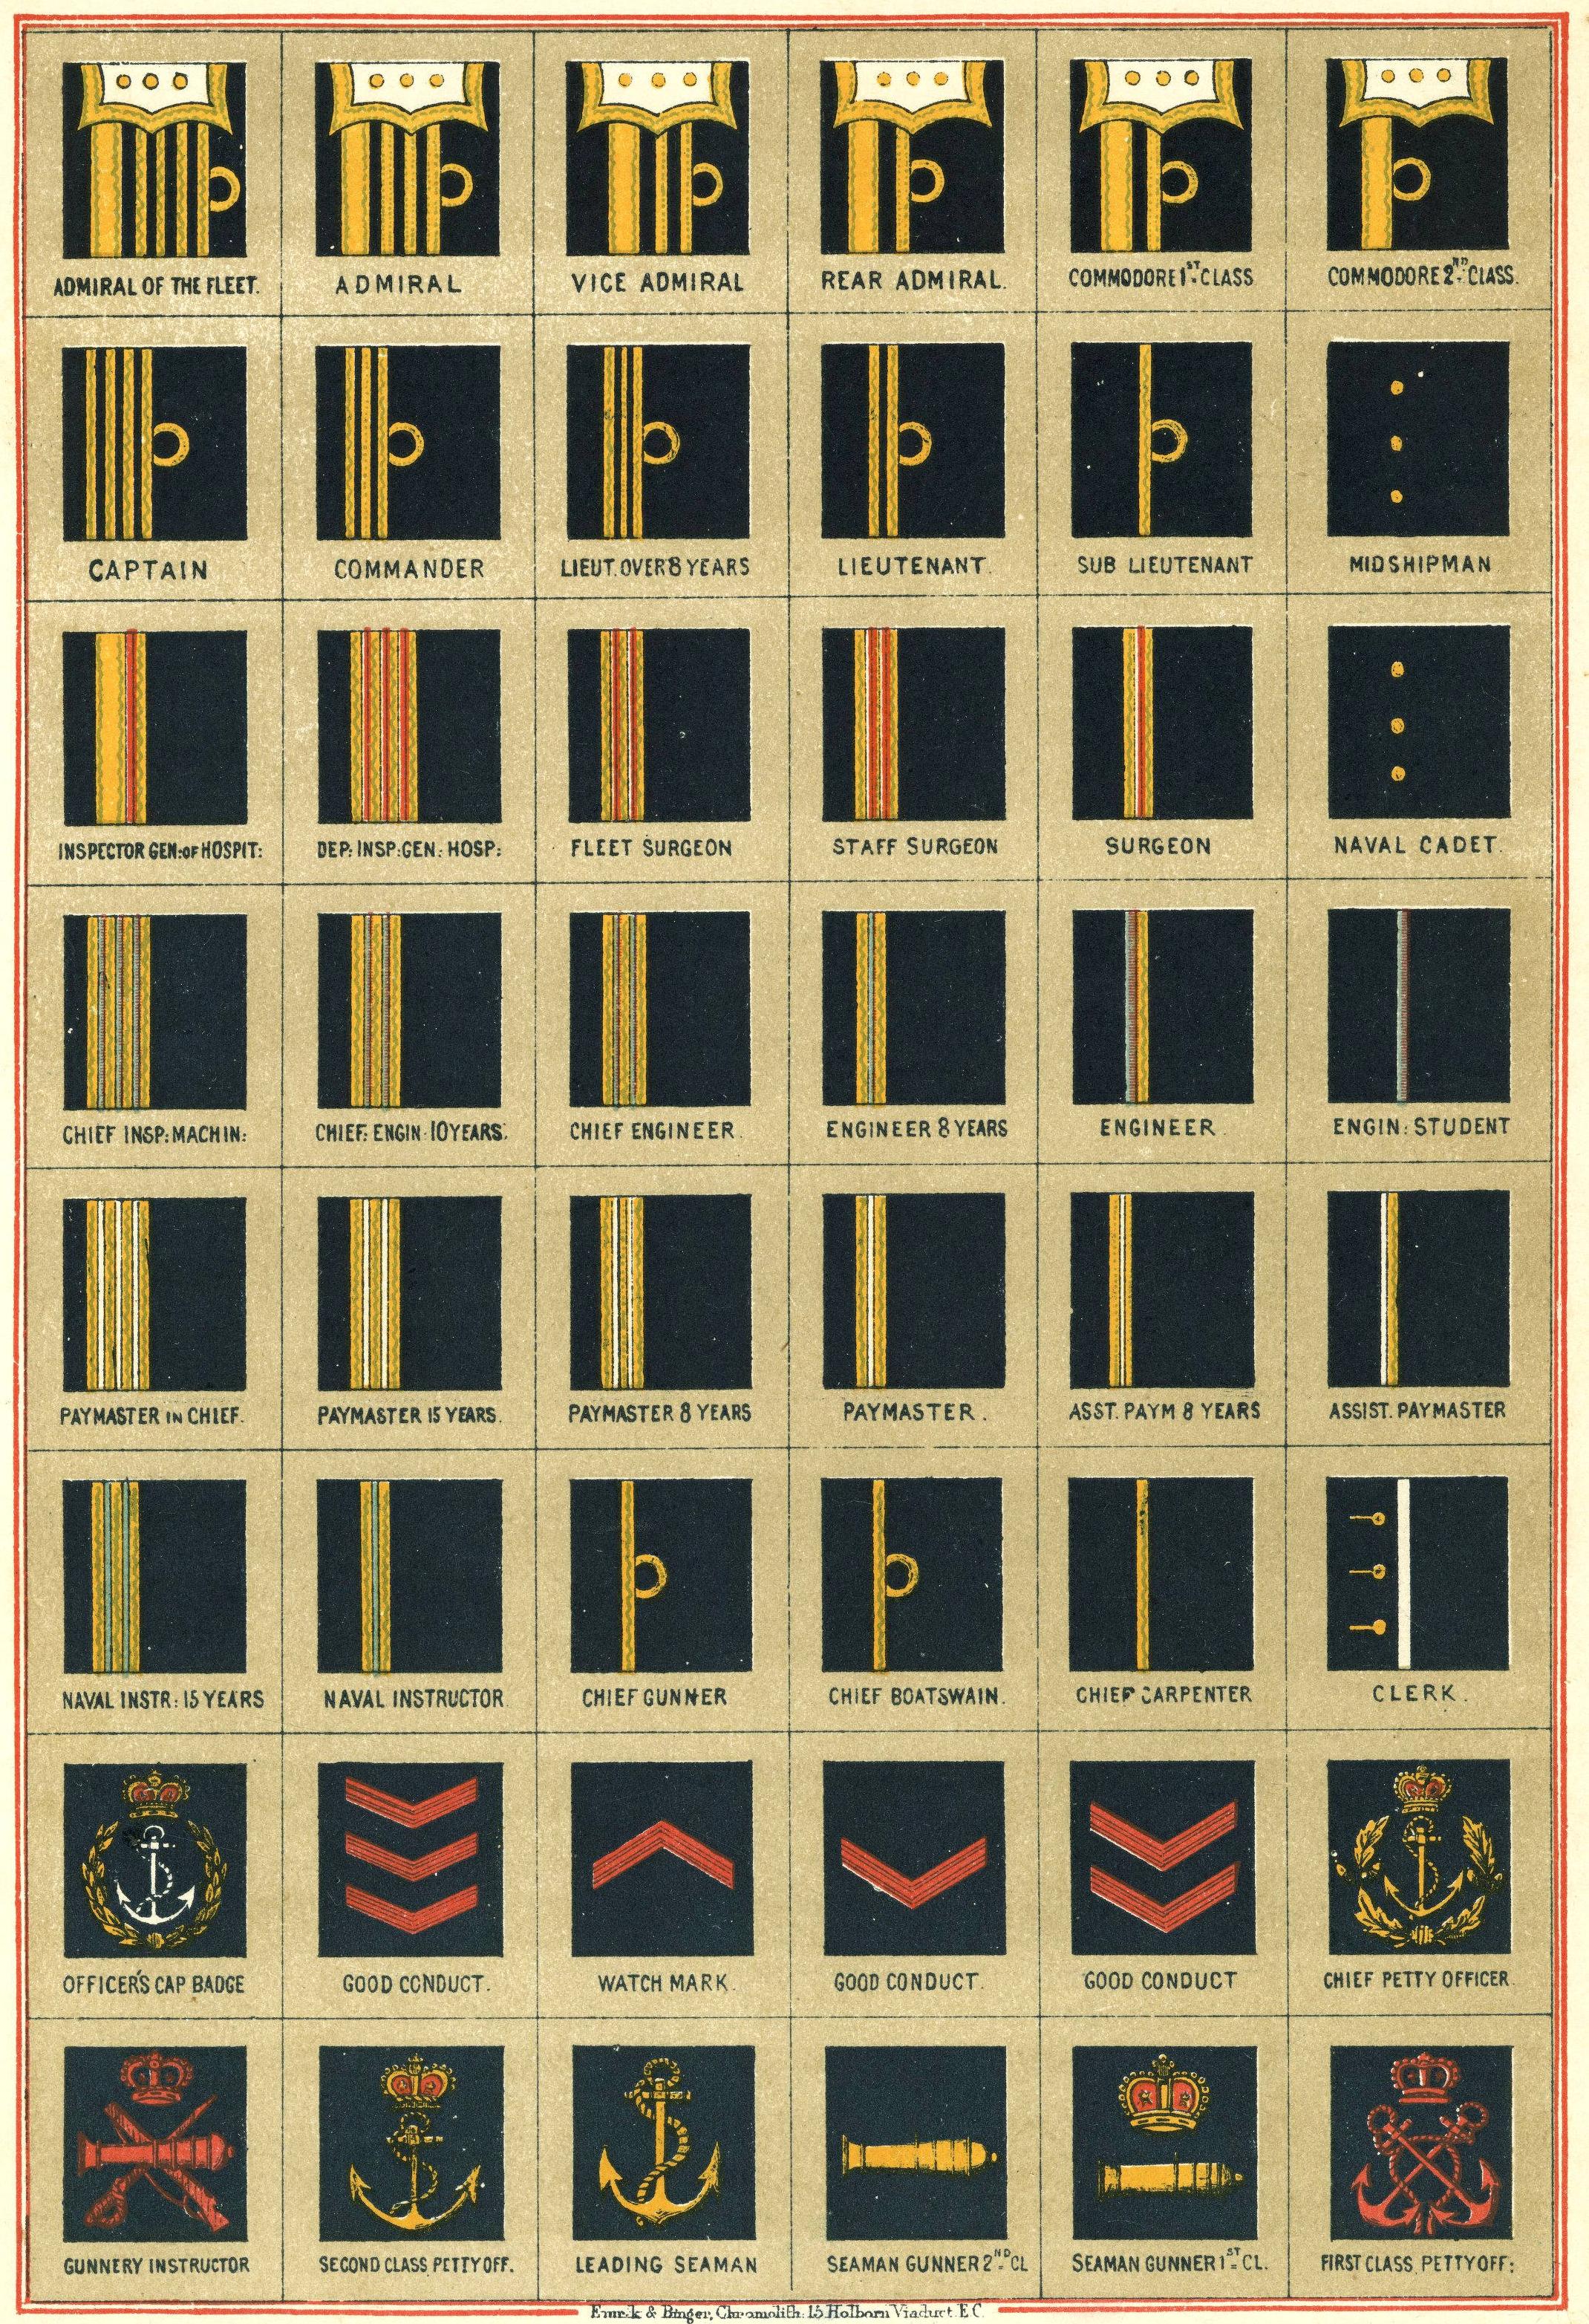 http://www.victorianweb.org/victorian/history/navy/4.jpg